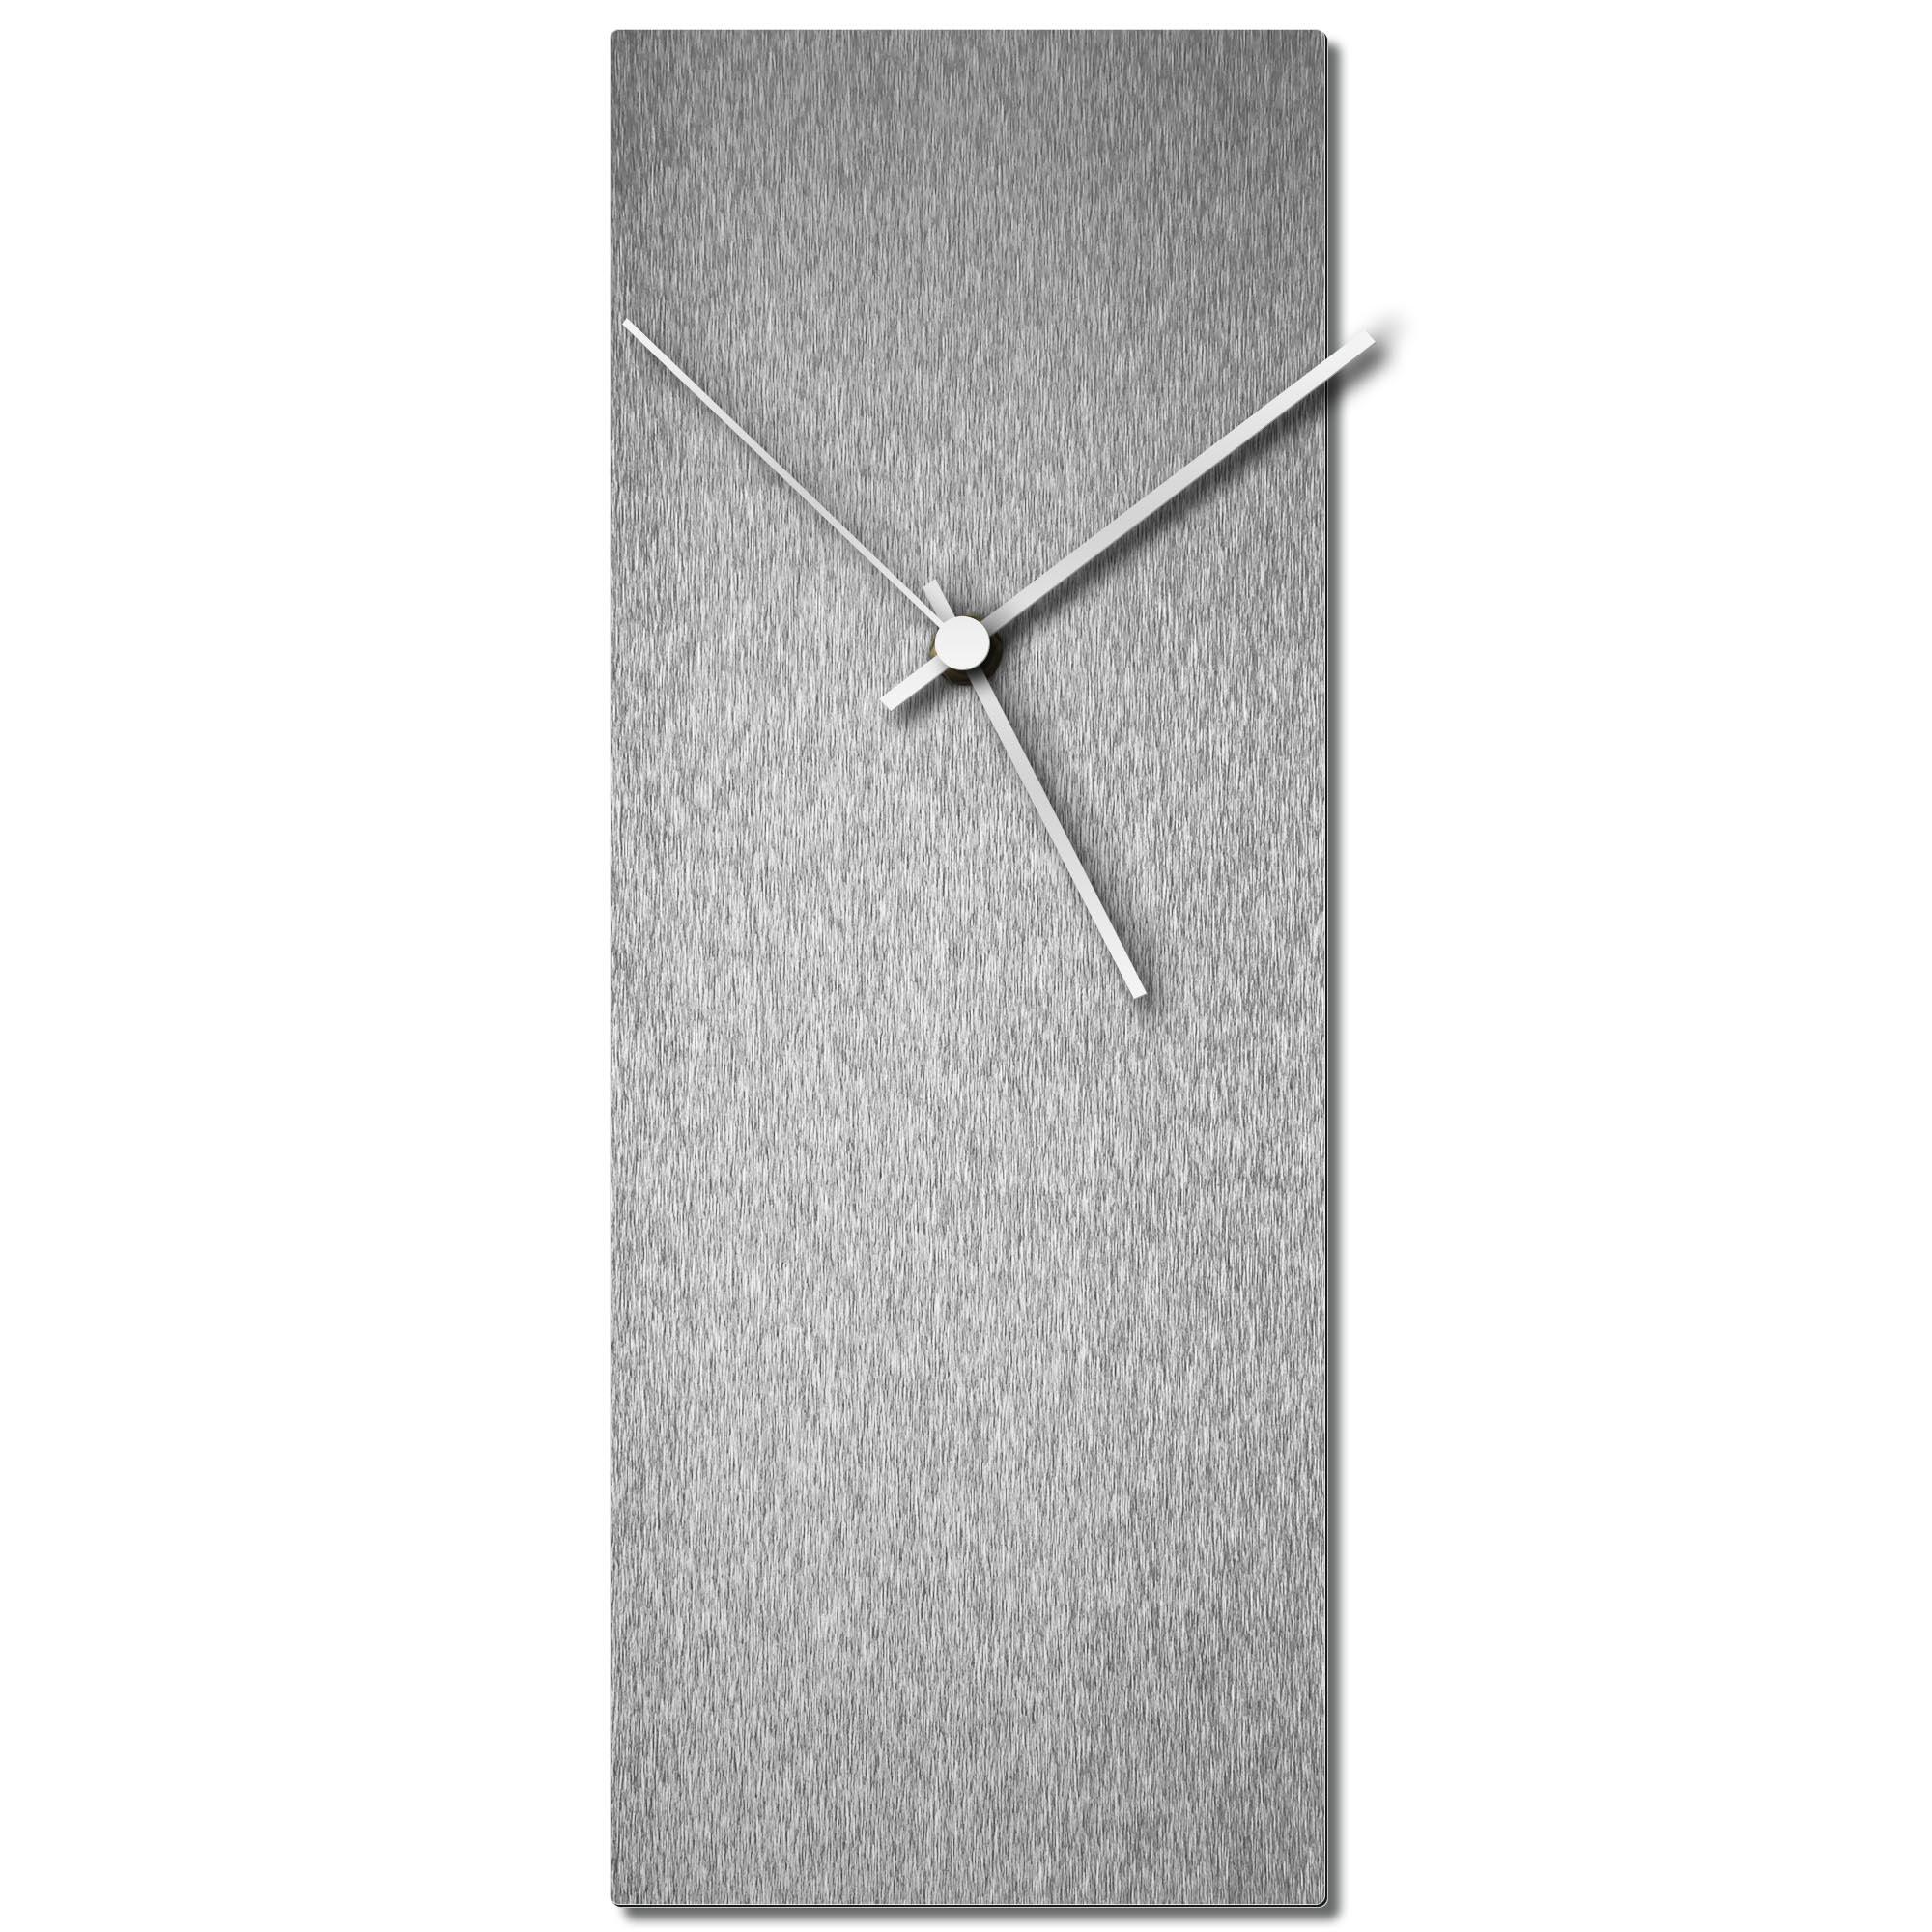 Adam Schwoeppe 'Silversmith Clock White' Midcentury Modern Style Wall Clock